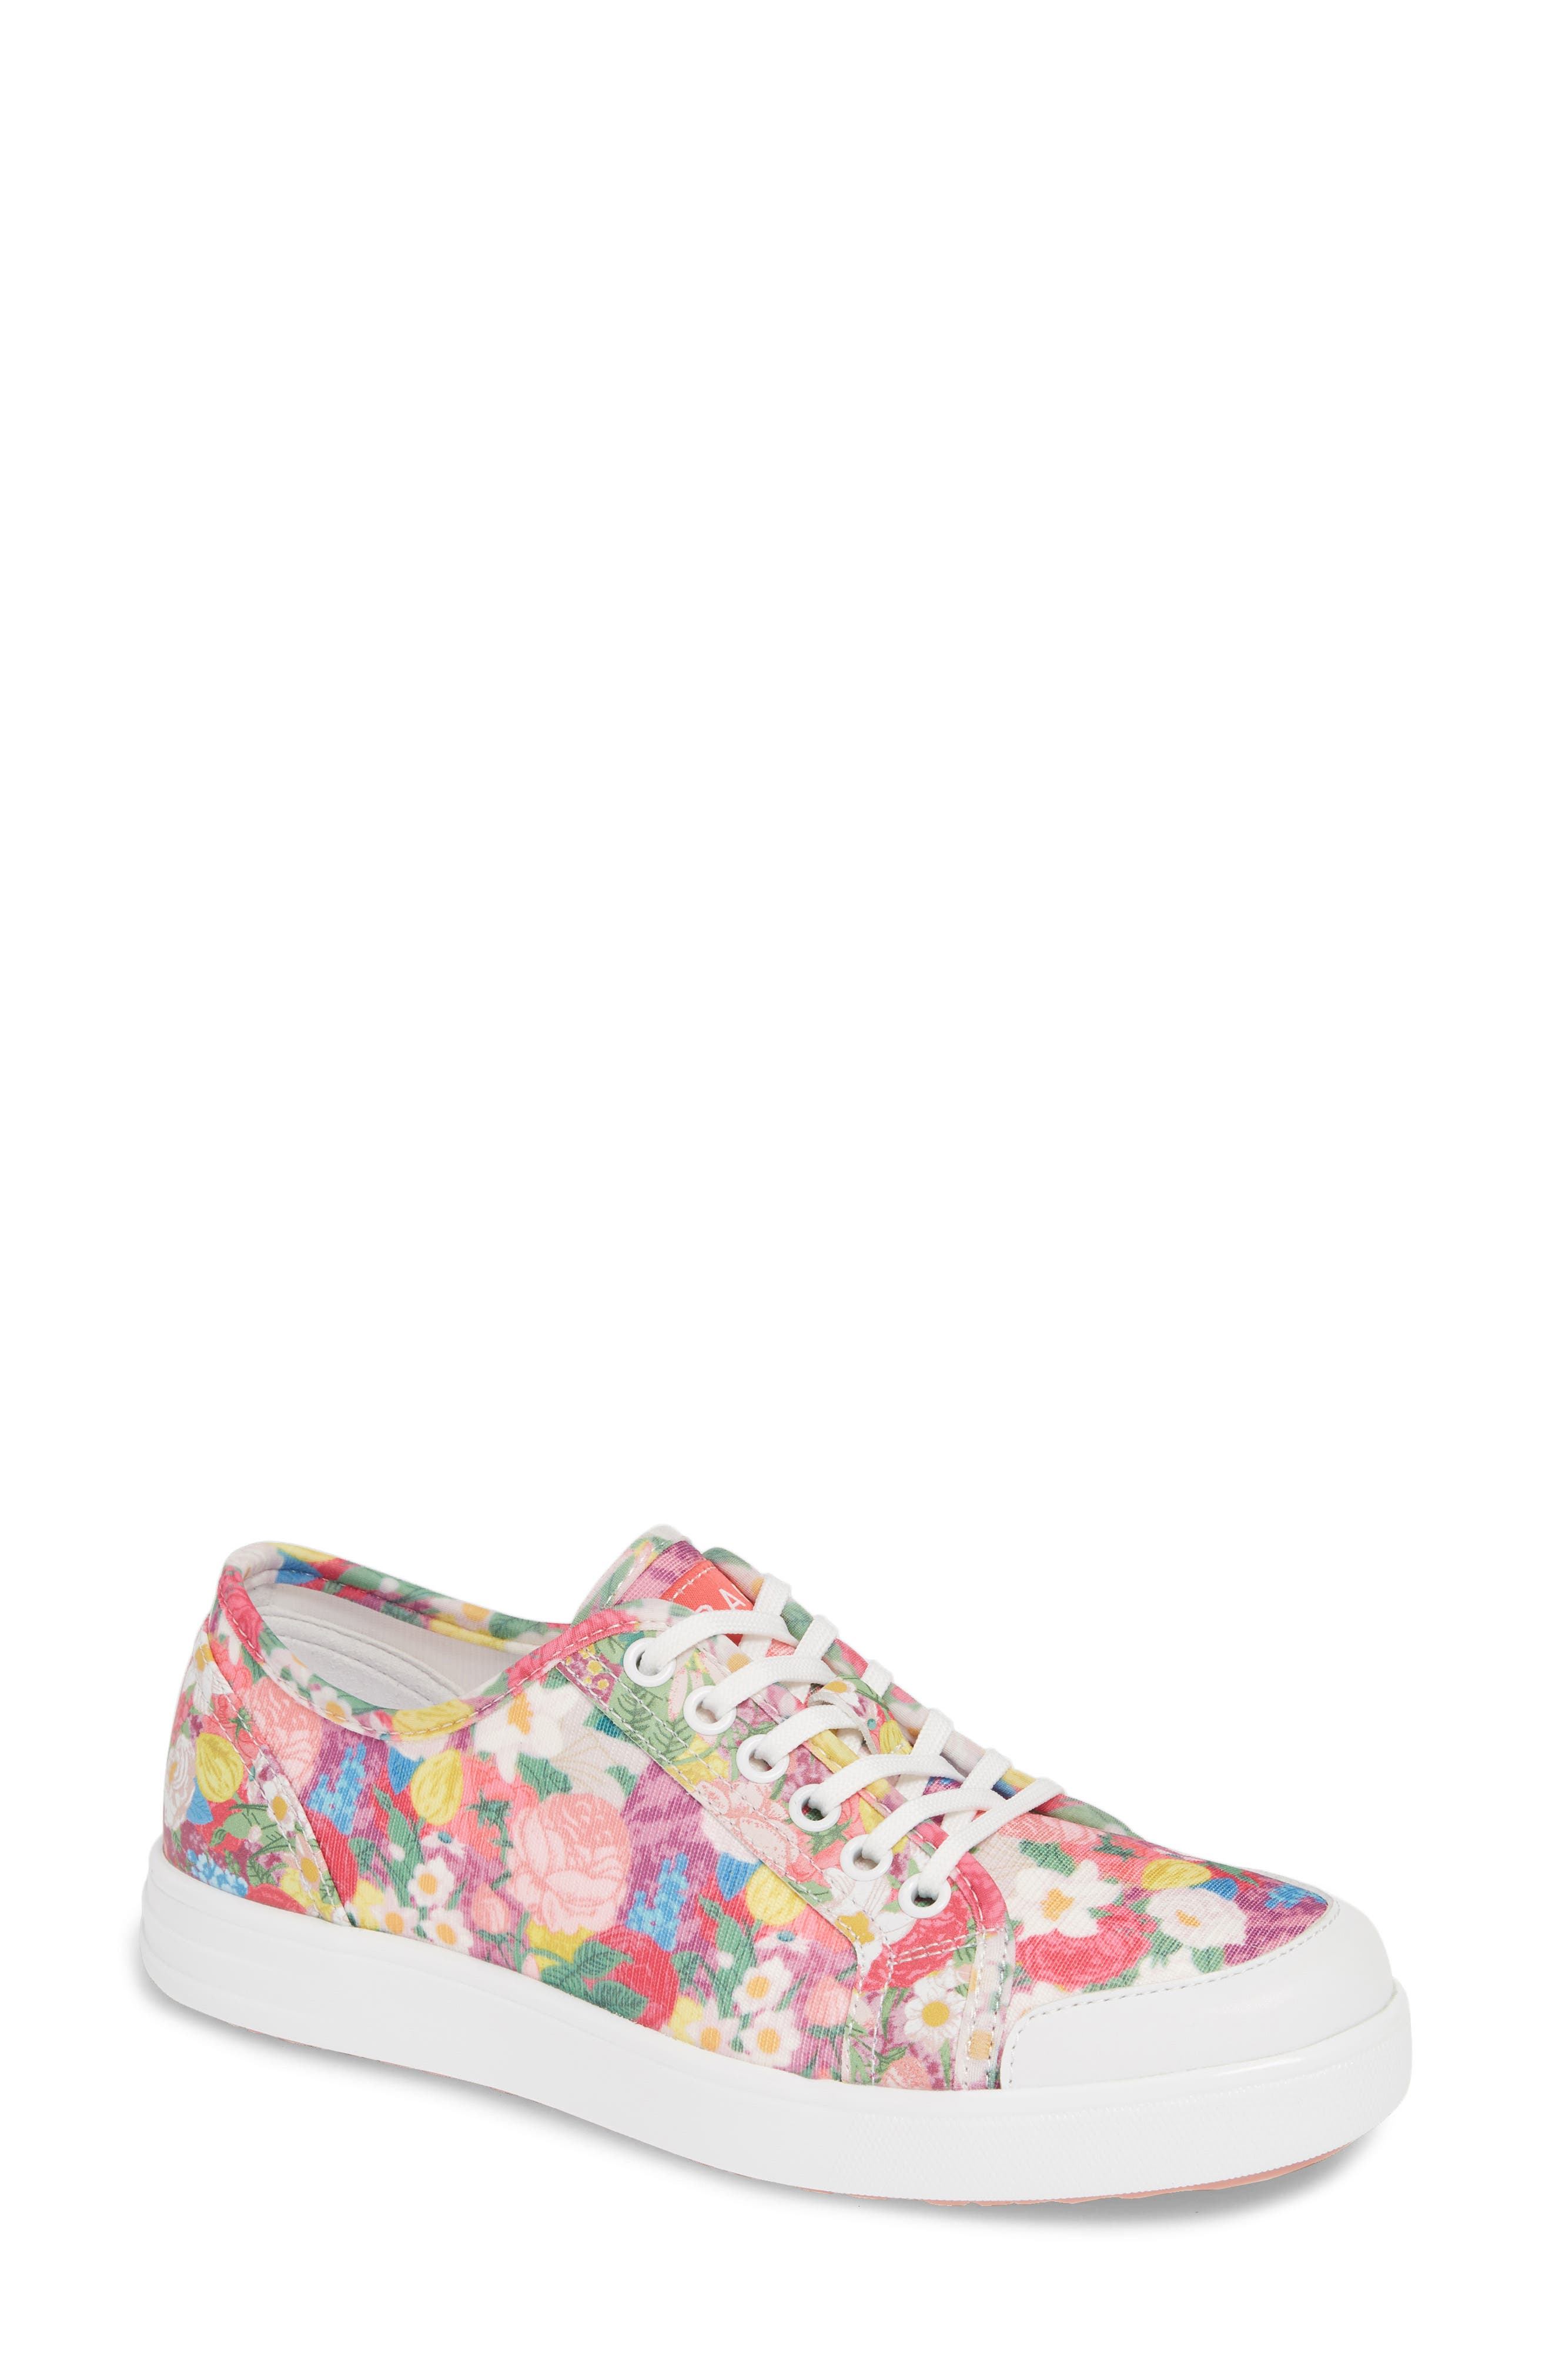 Alegria Sneaq Sneaker - Pink